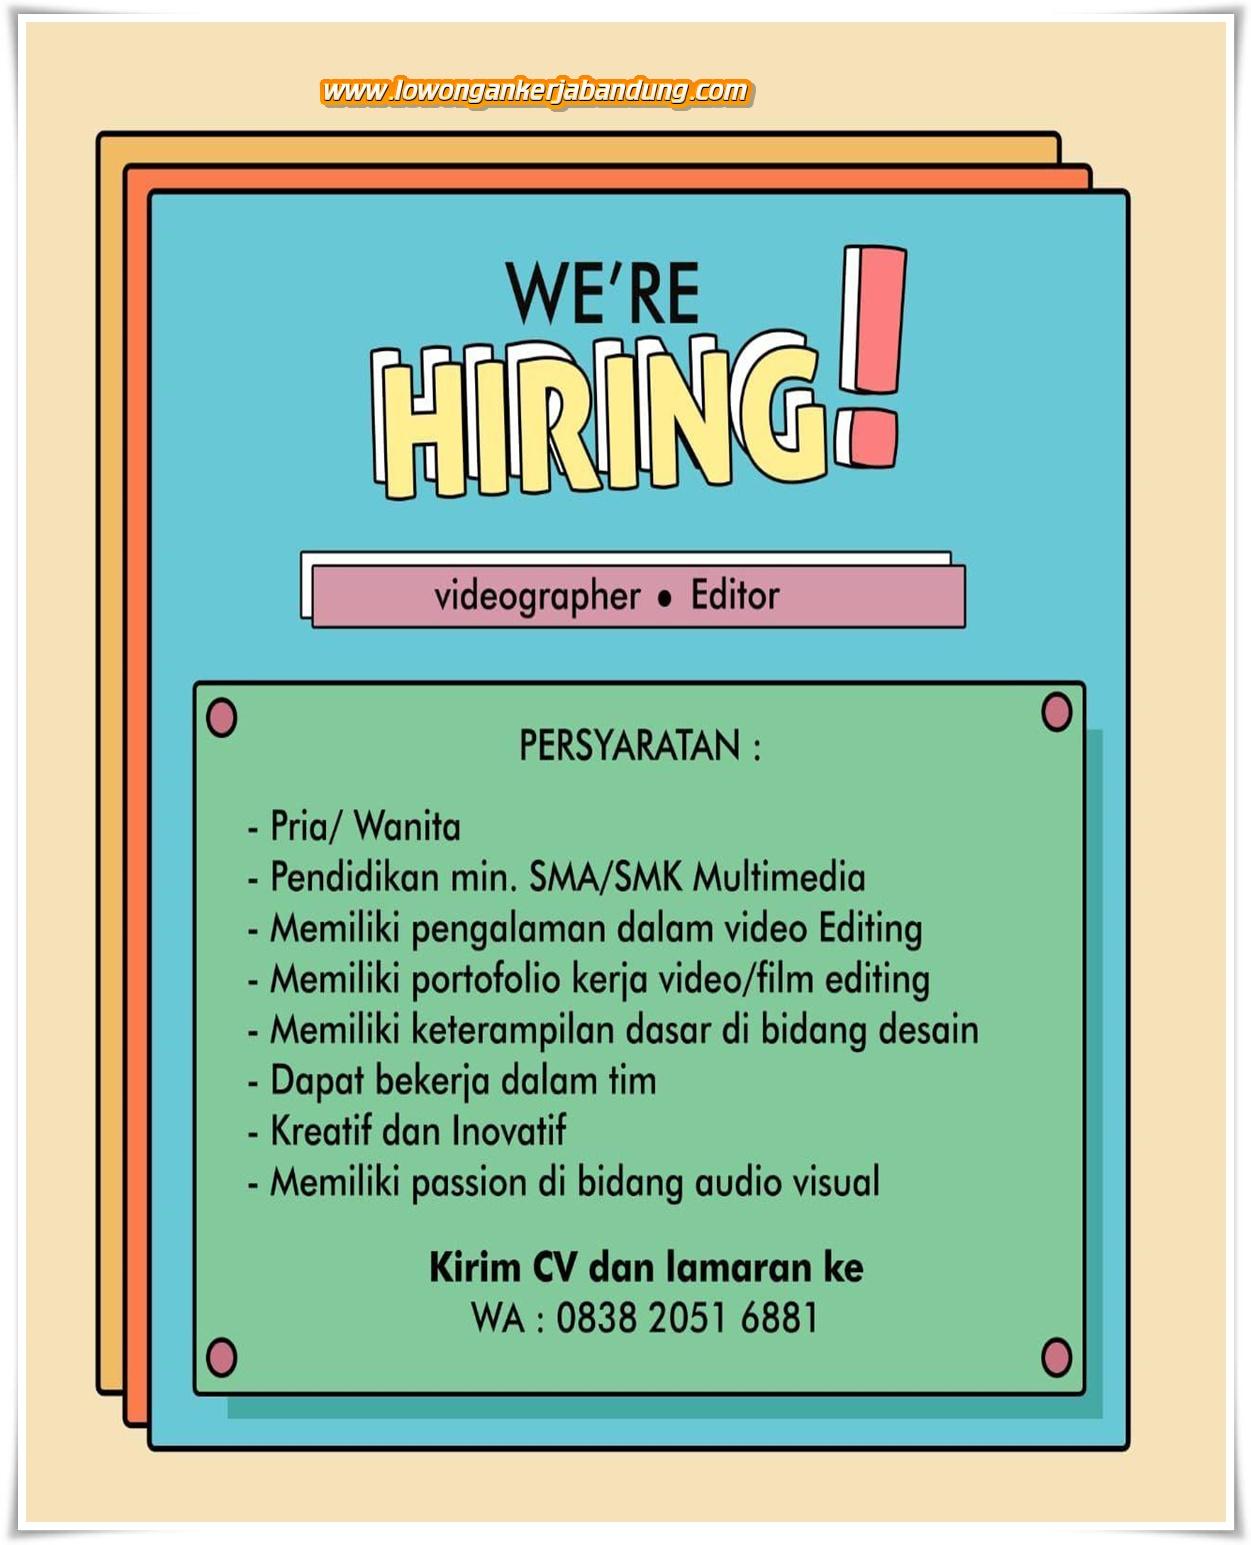 Lowongan Kerja Videographer Editor Di Bandung